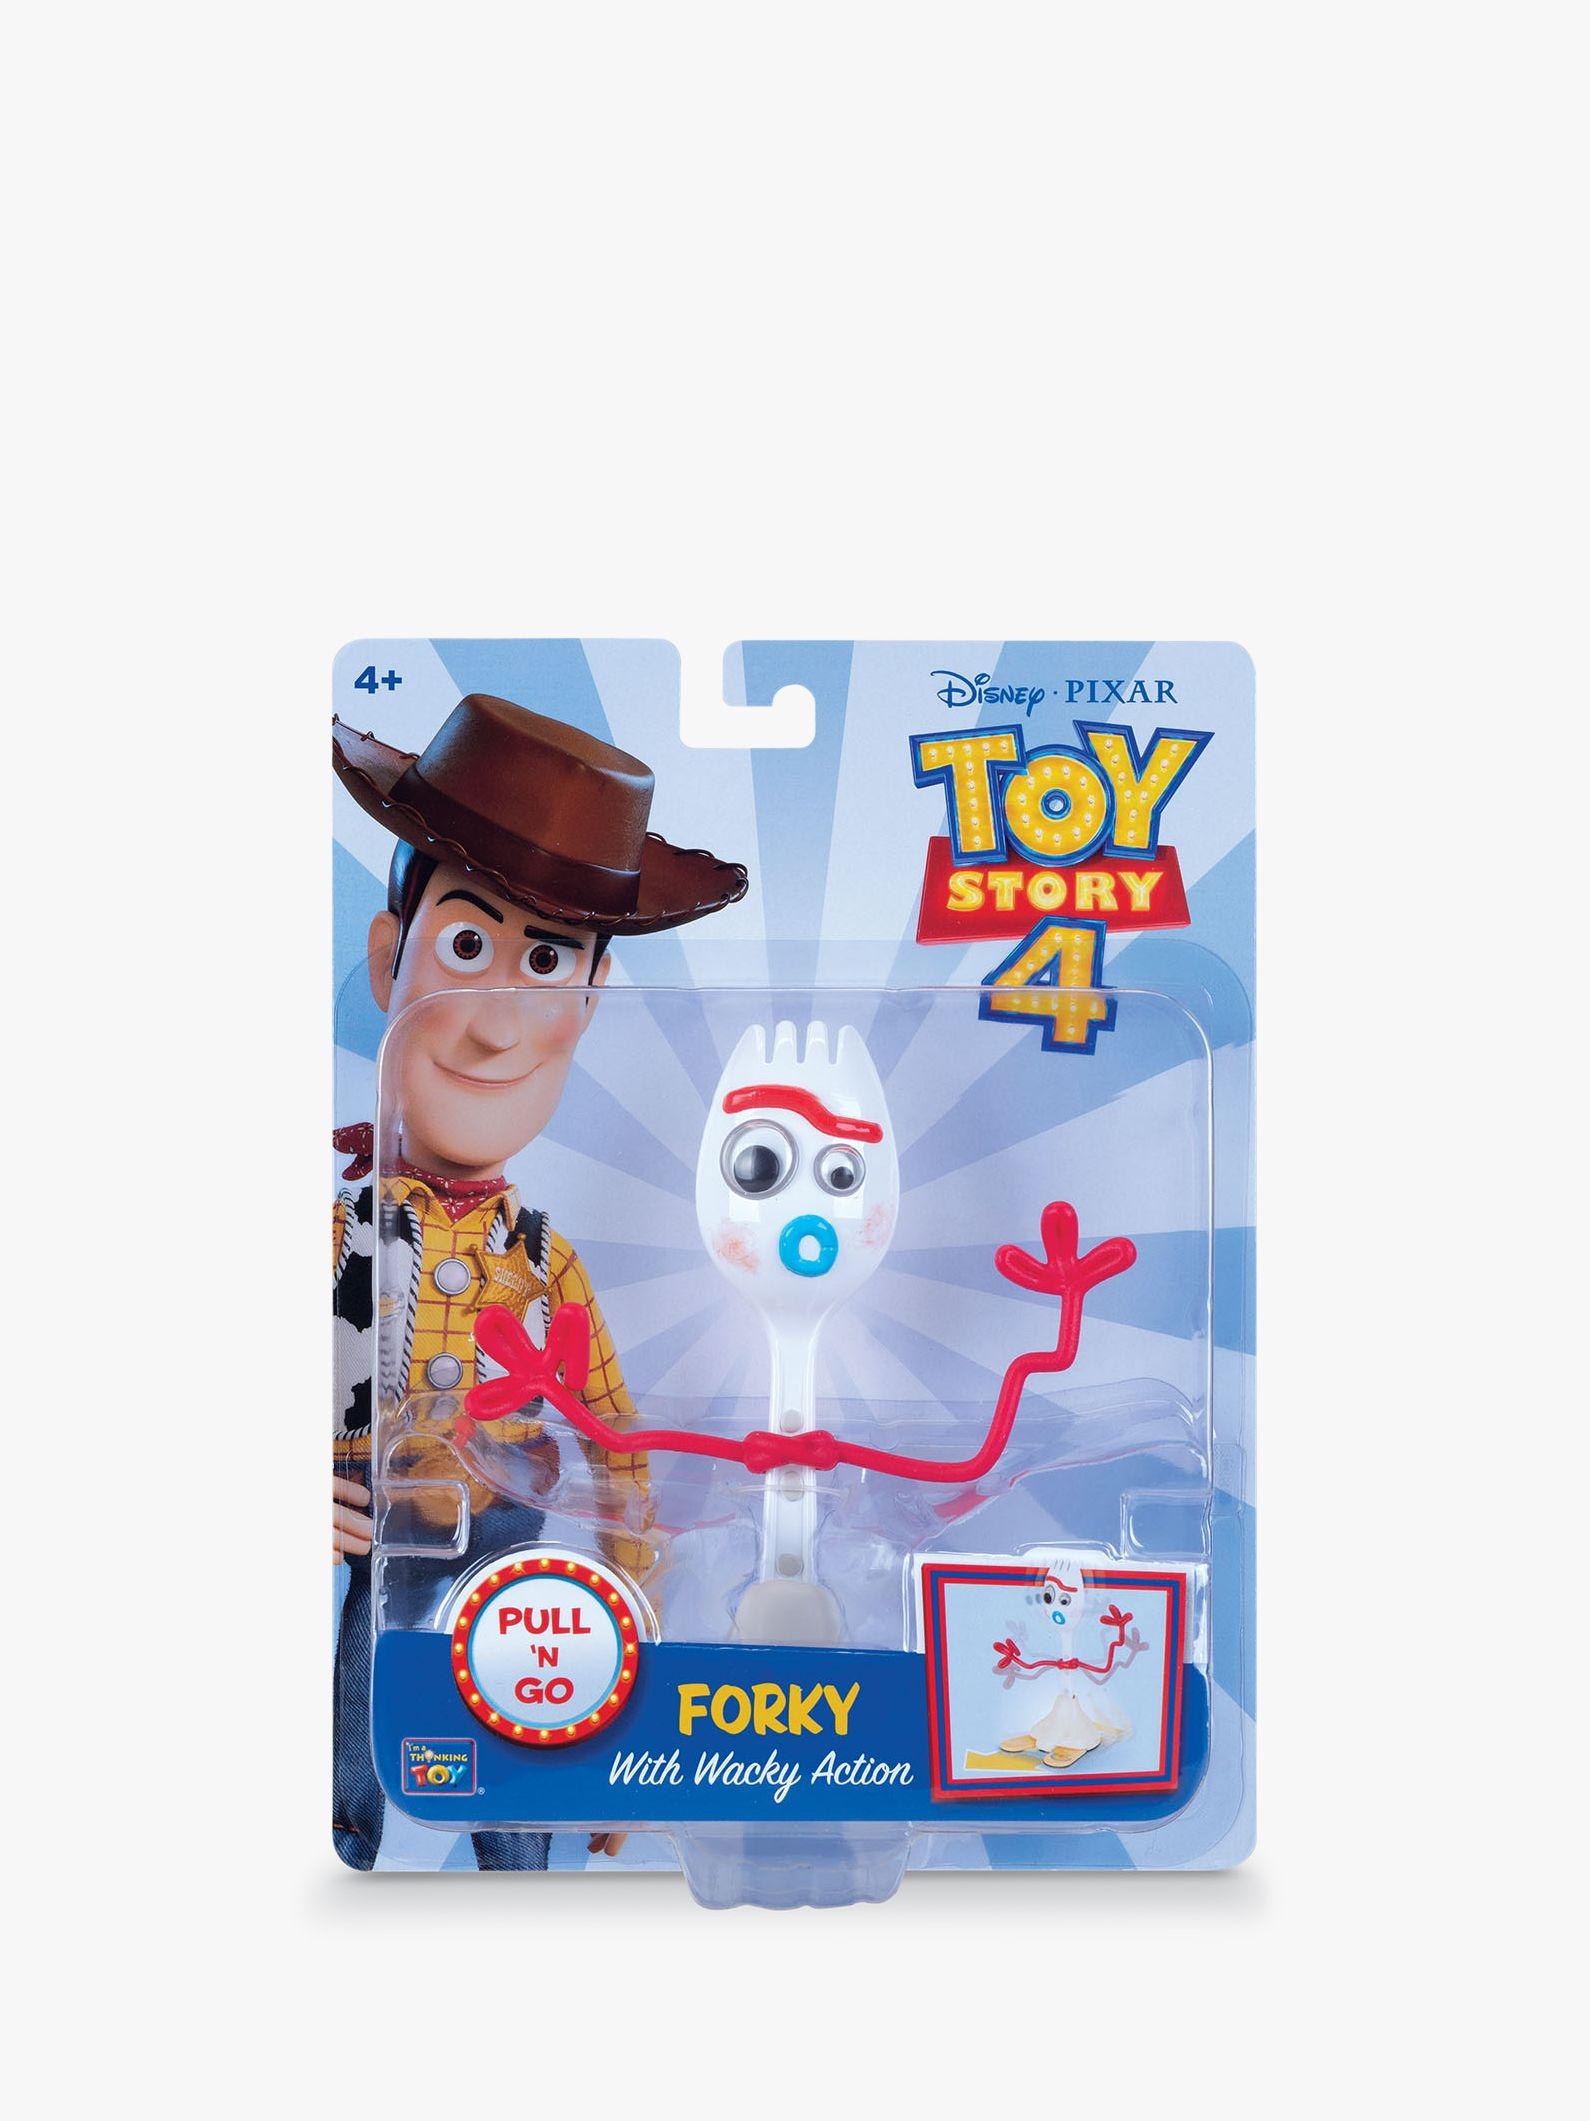 Disney Disney Pixar Toy Story 4 Forky Toy